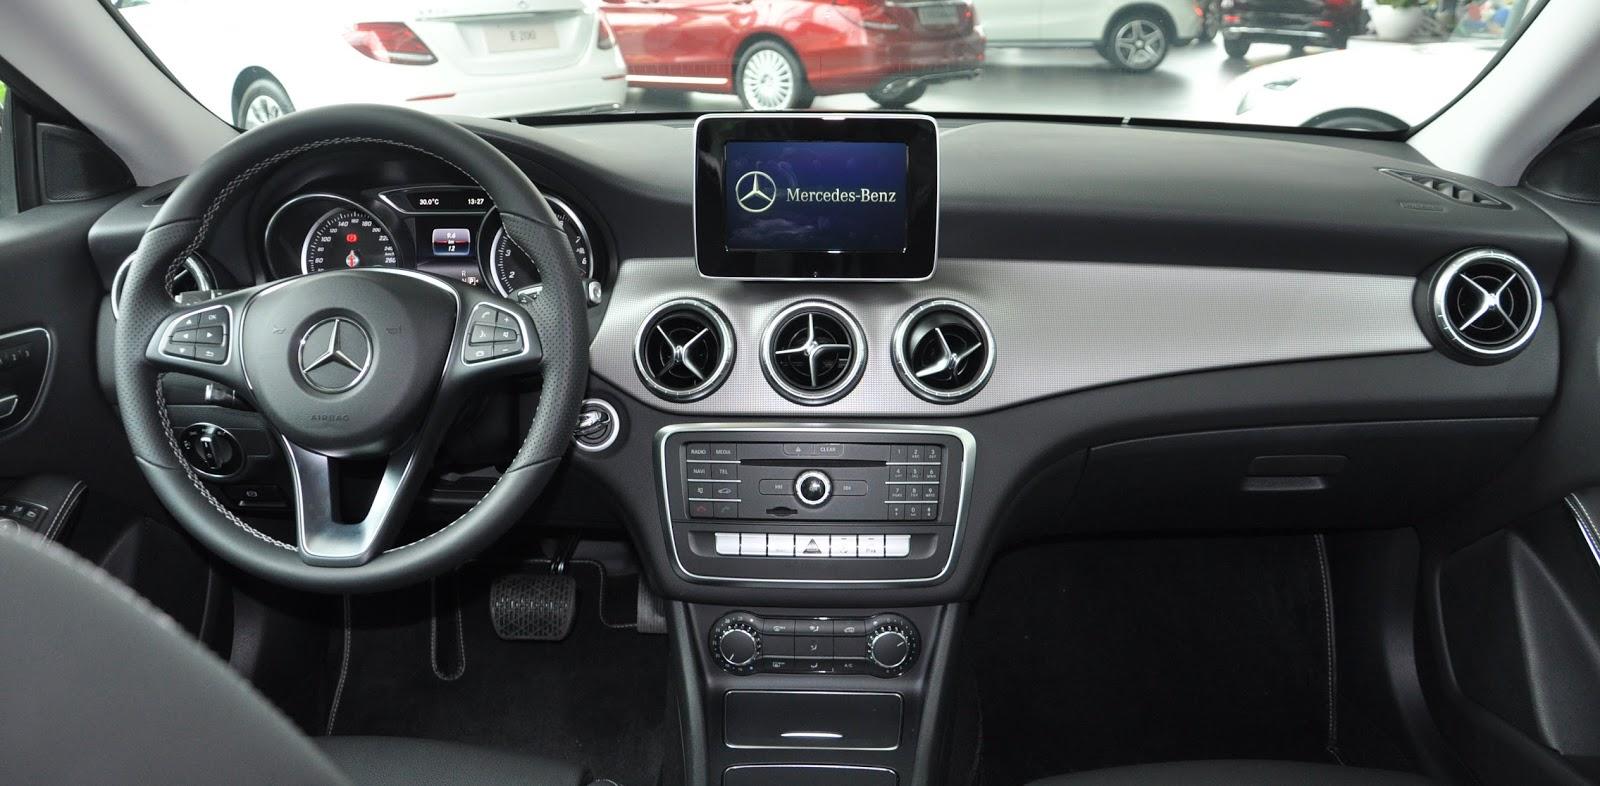 Nội thất xe Mercedes Benz CLA 200 New Model màu nâu 02